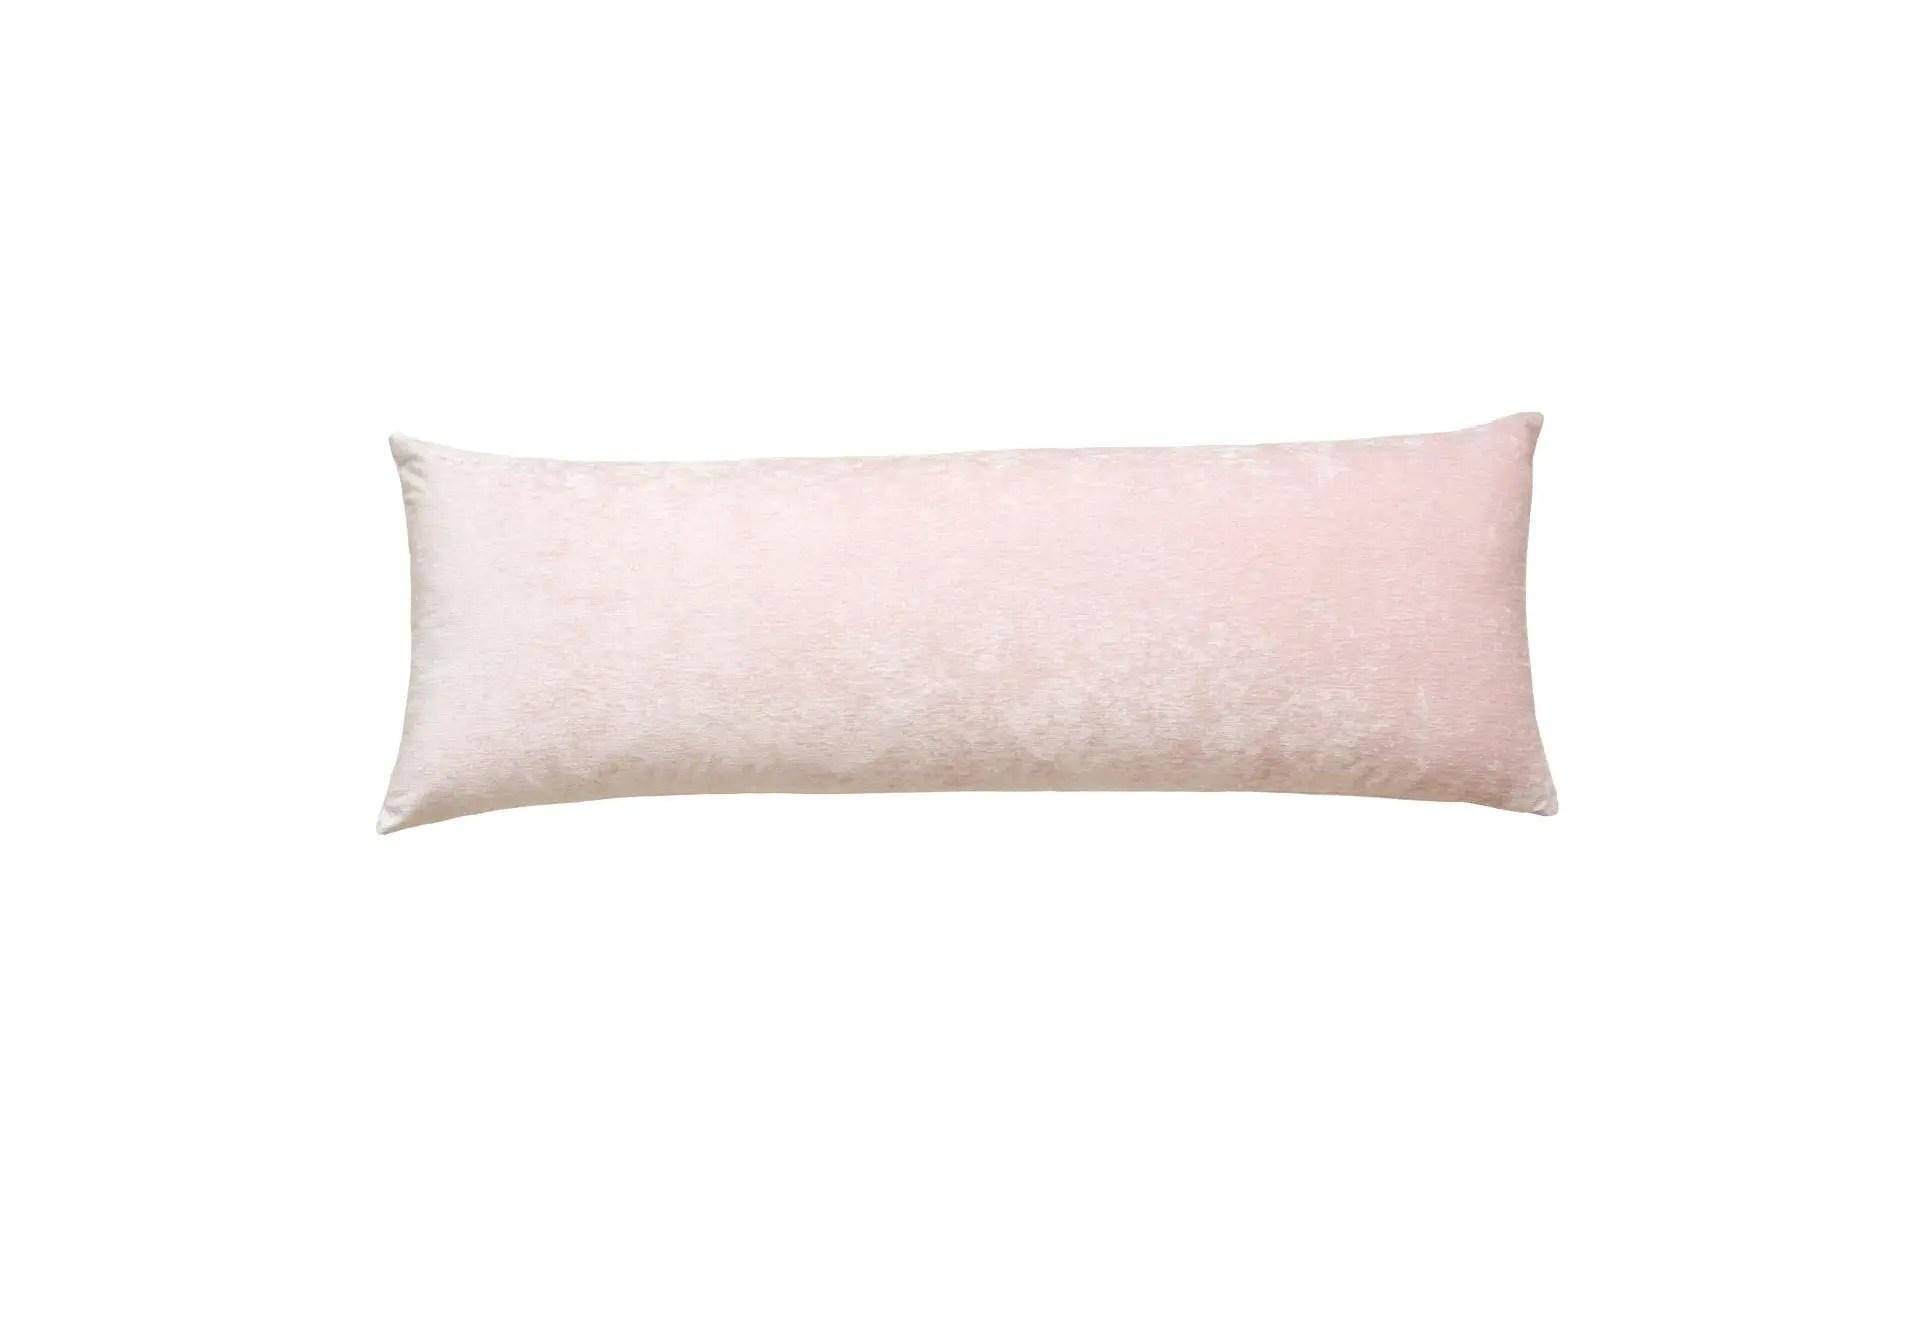 velvet blush large lumbar pillow